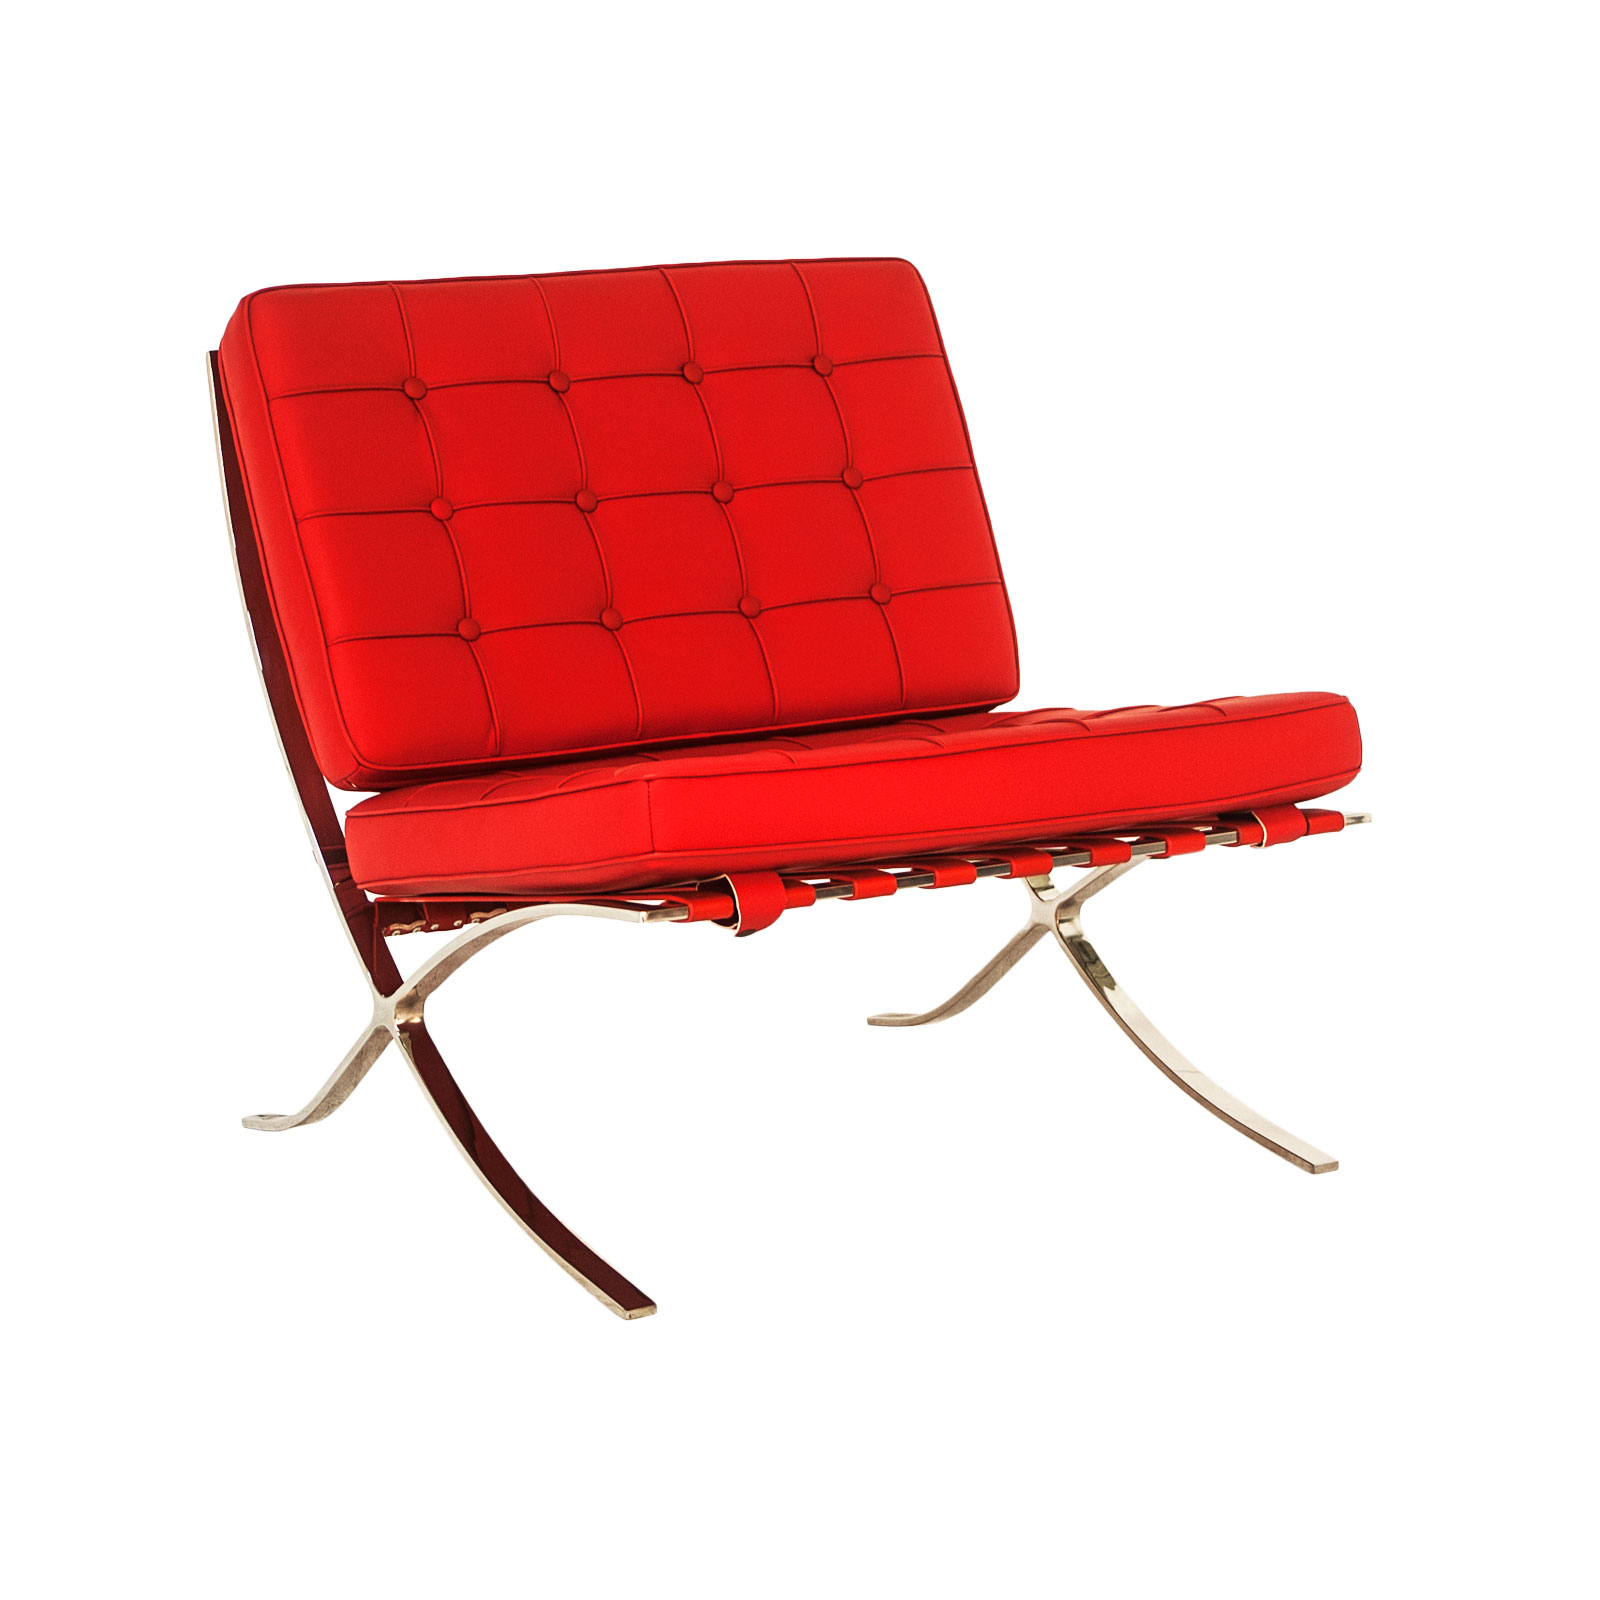 Barcelona Lounge Chair Rentals Mies van der Rohe Furniture Rental